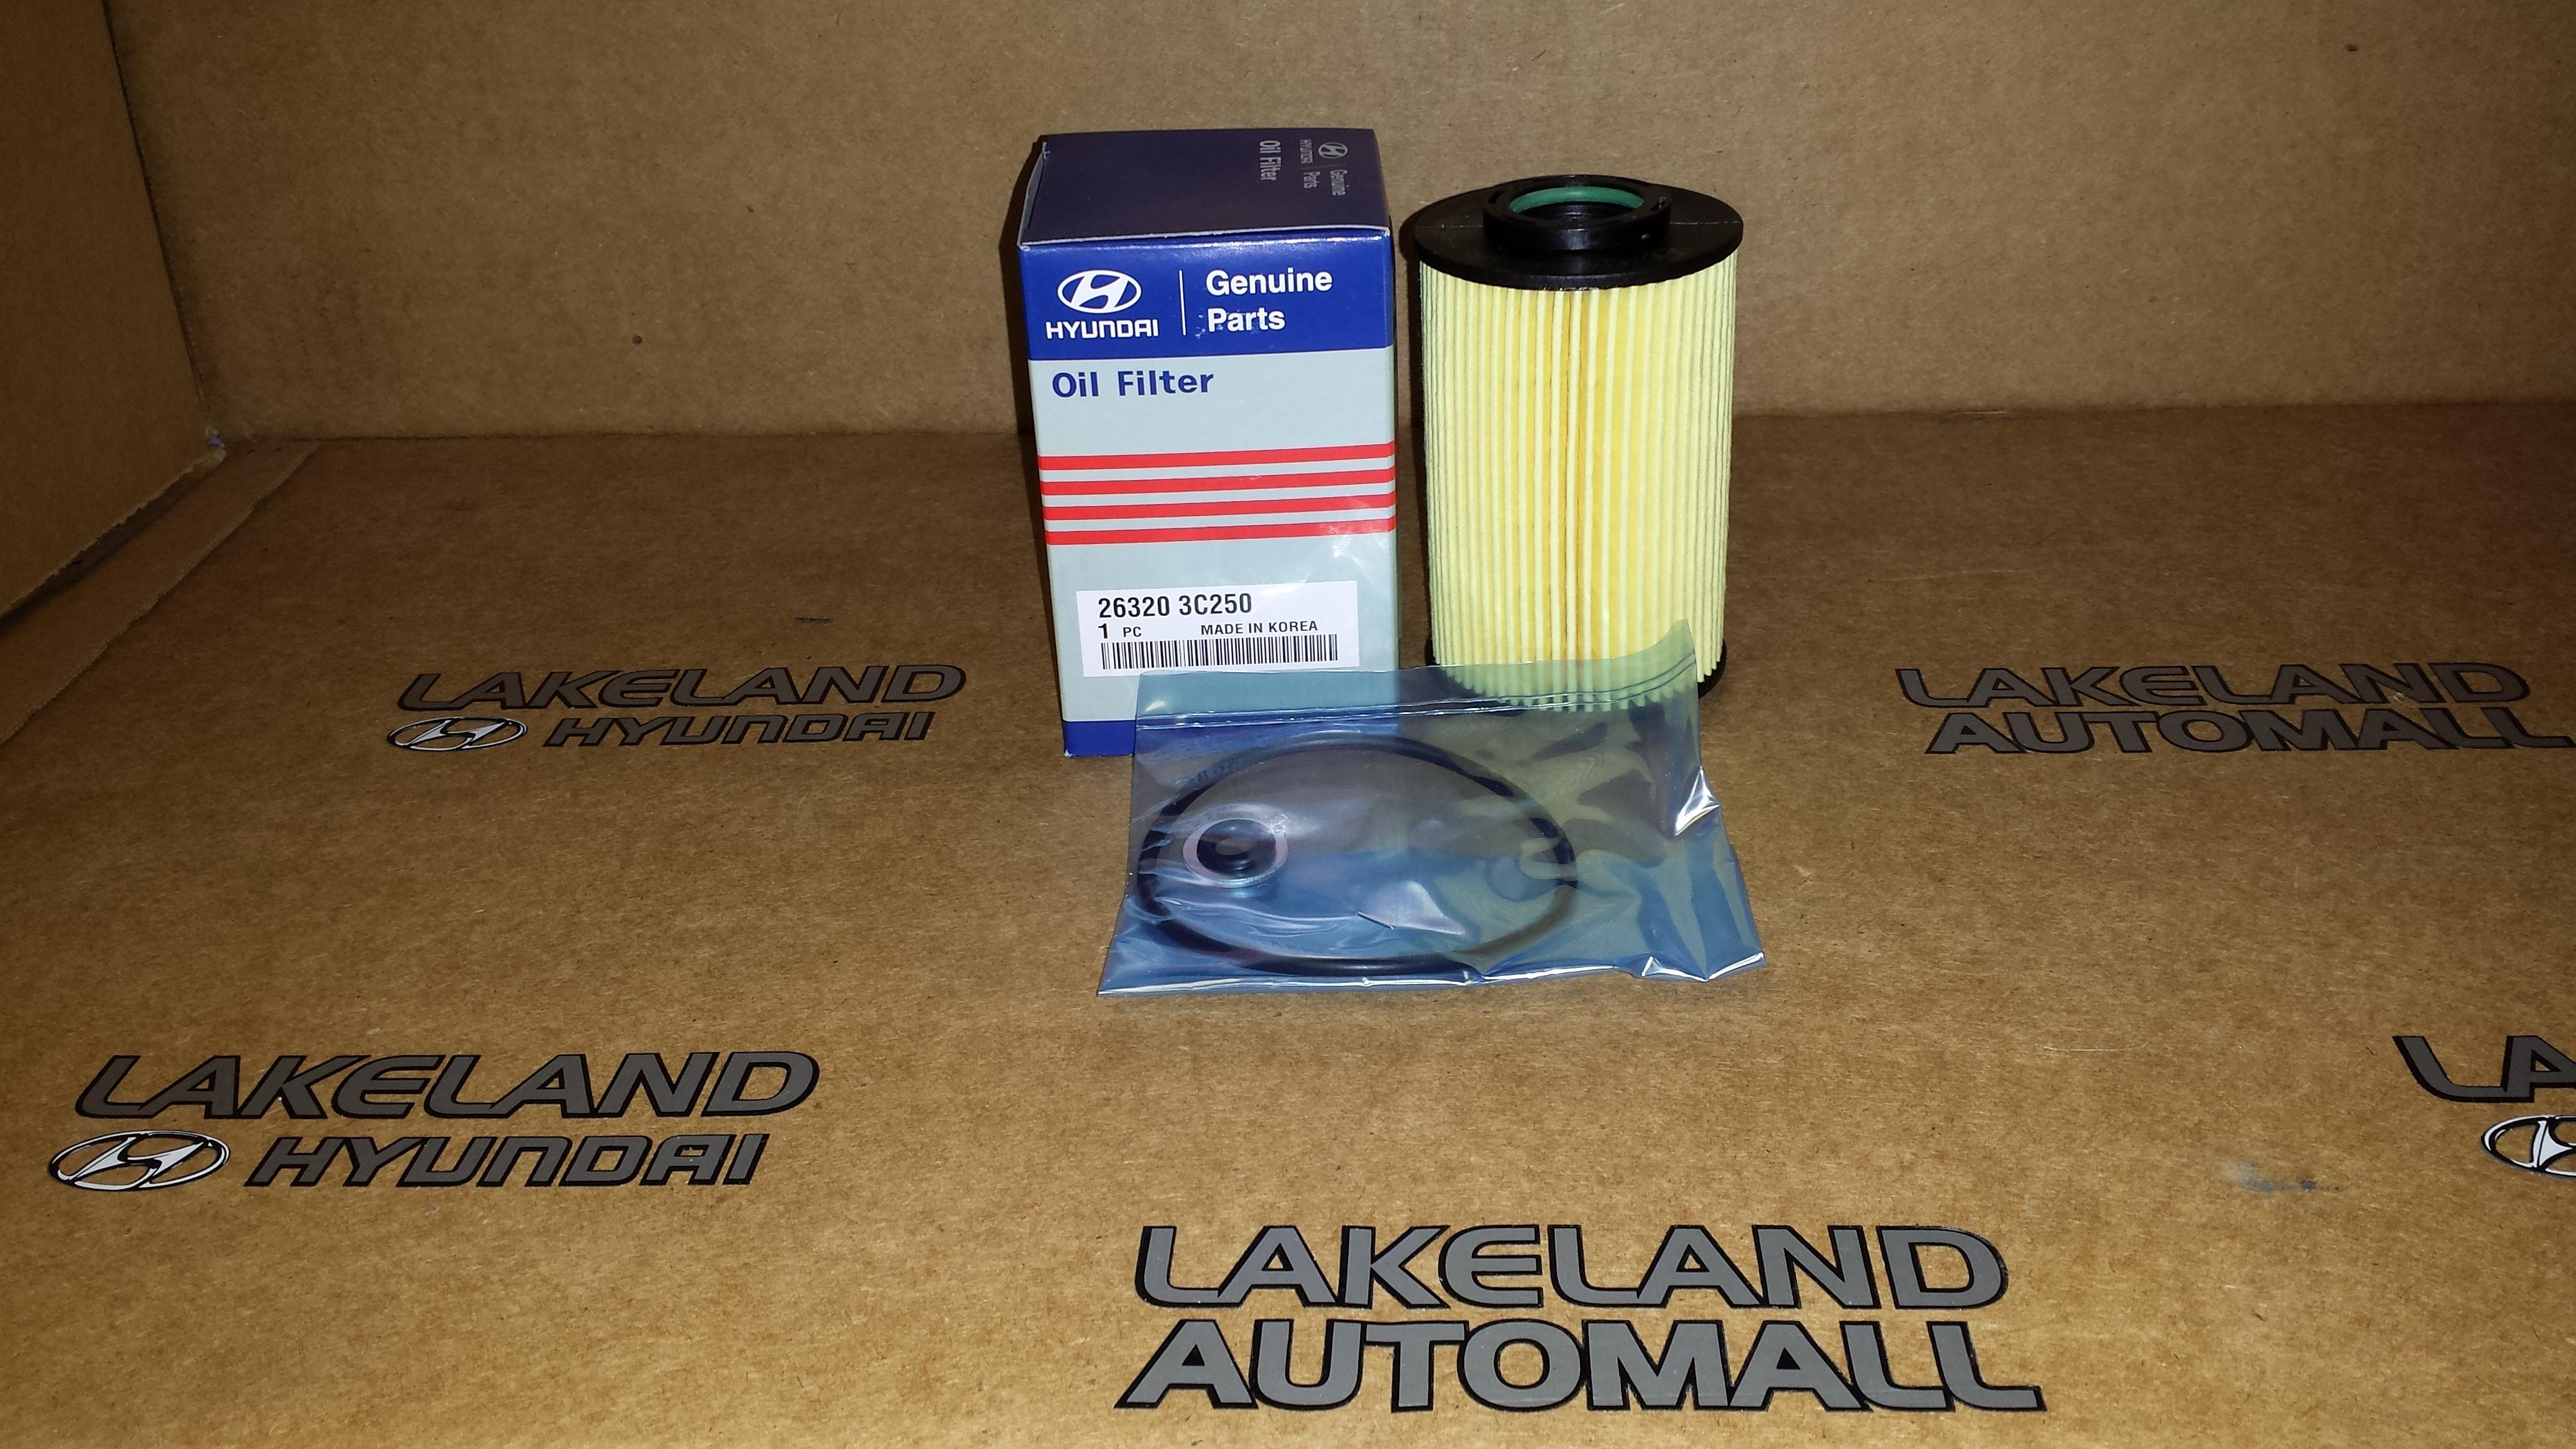 263203C250  Hyundai Service kit     oil       filter      2    pack of 30  Filters   Wholesale Hyundai